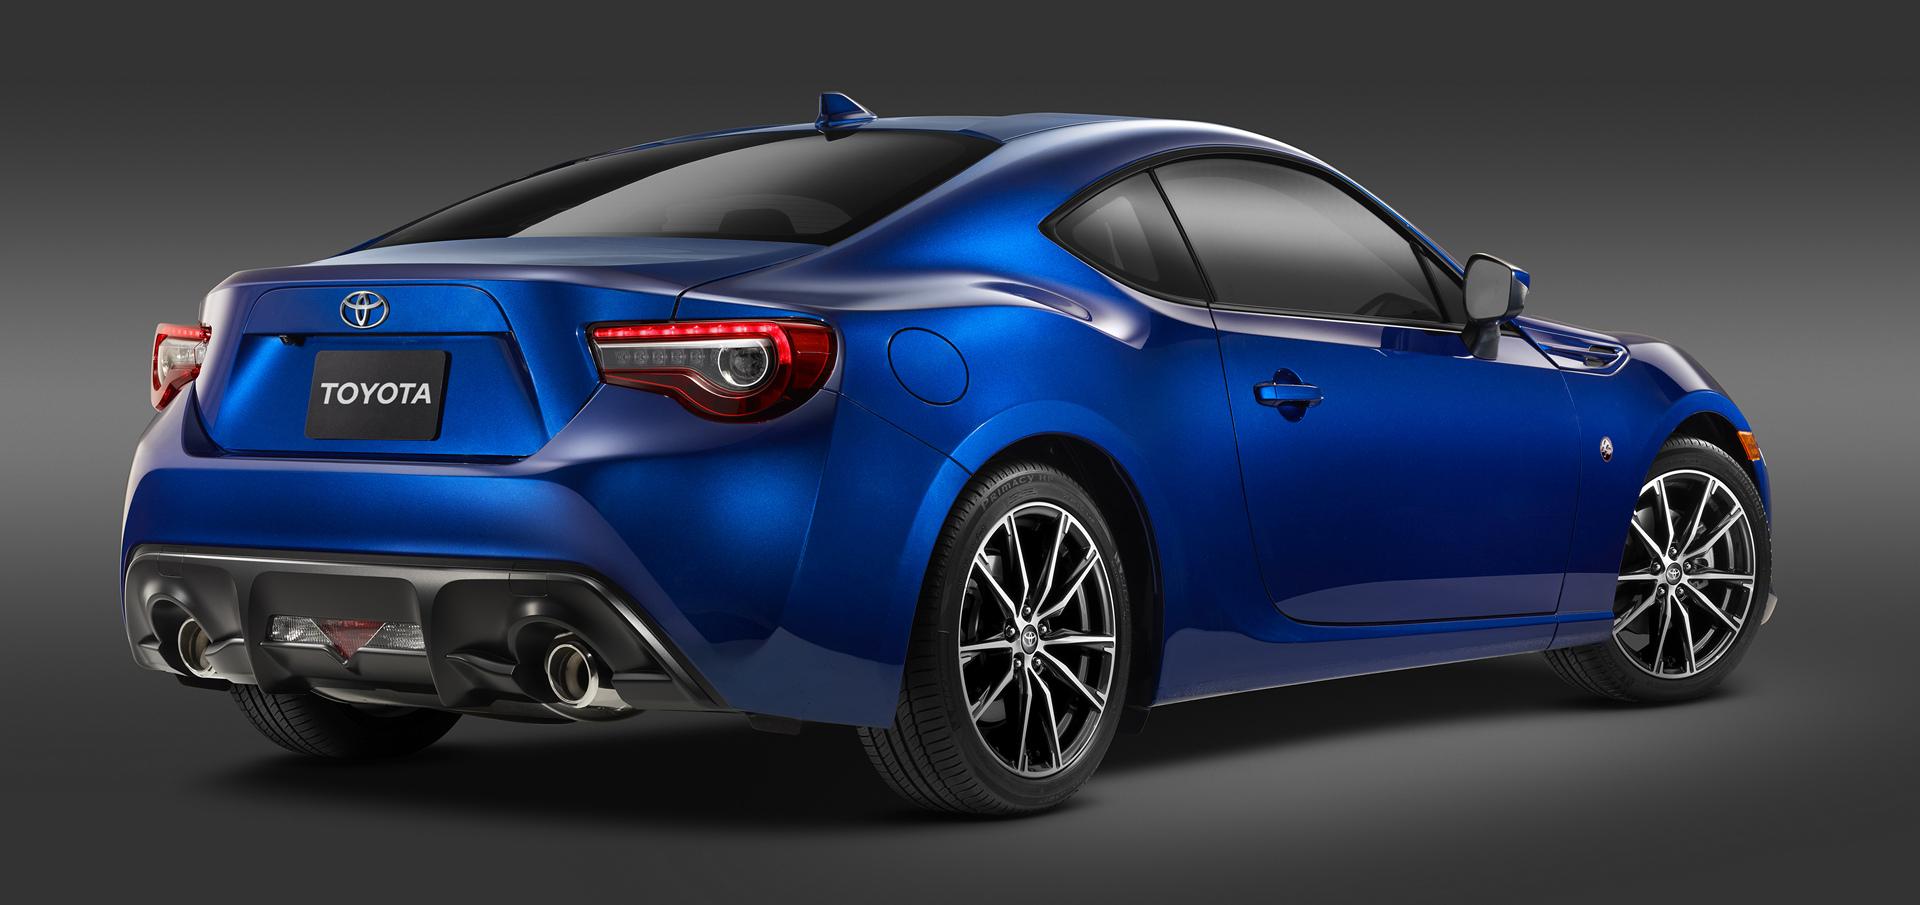 2017 Toyota 86 © Toyota Motor Corporation